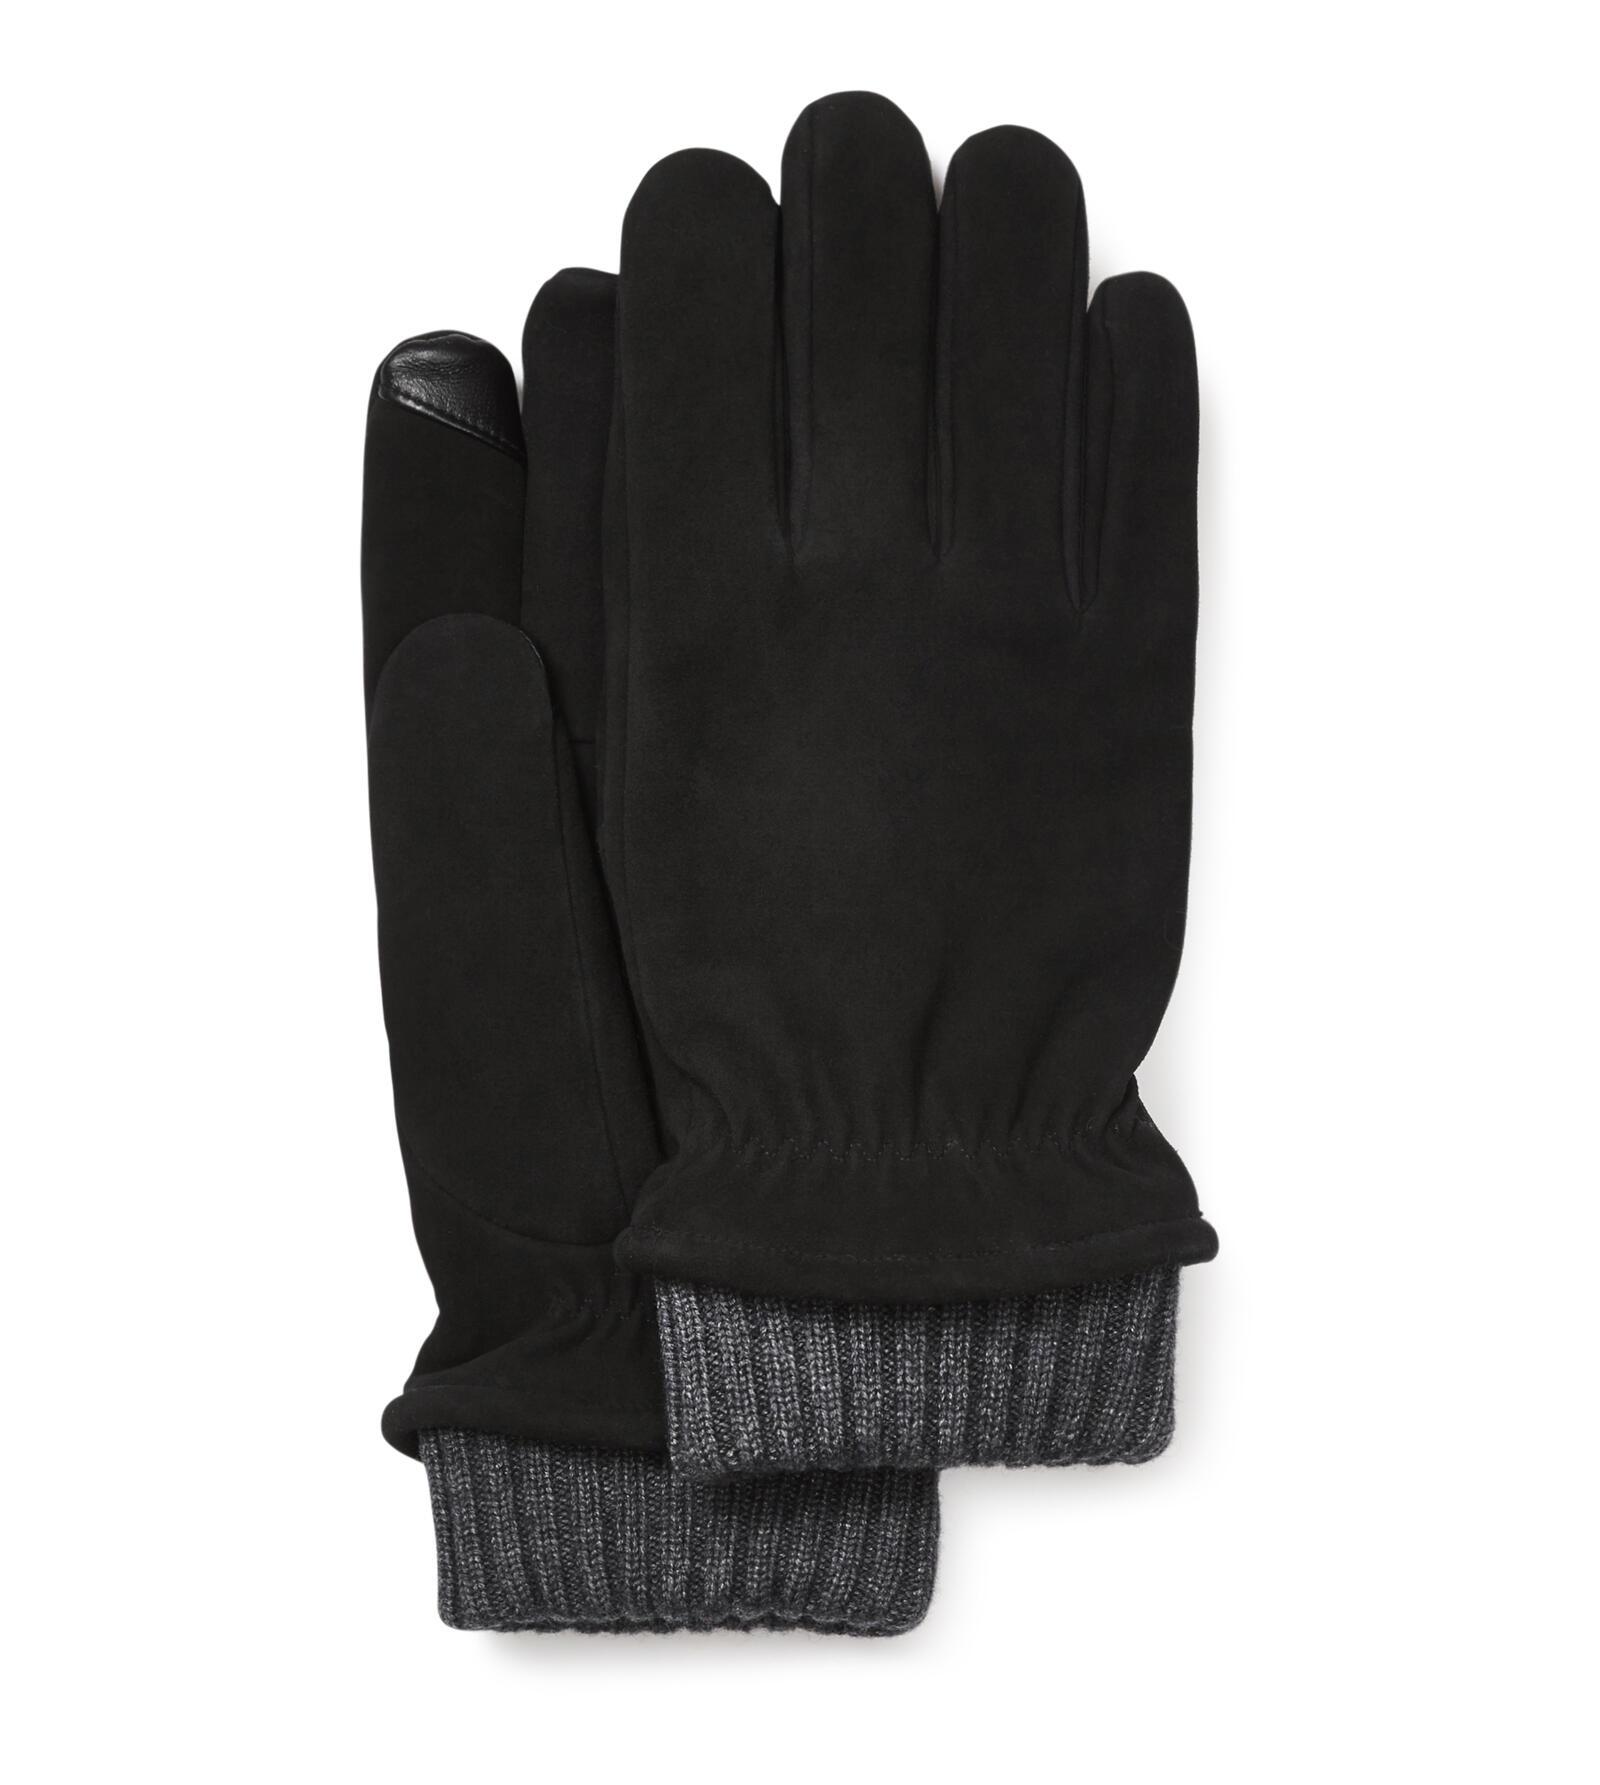 Suede Glove With Knit Cuff